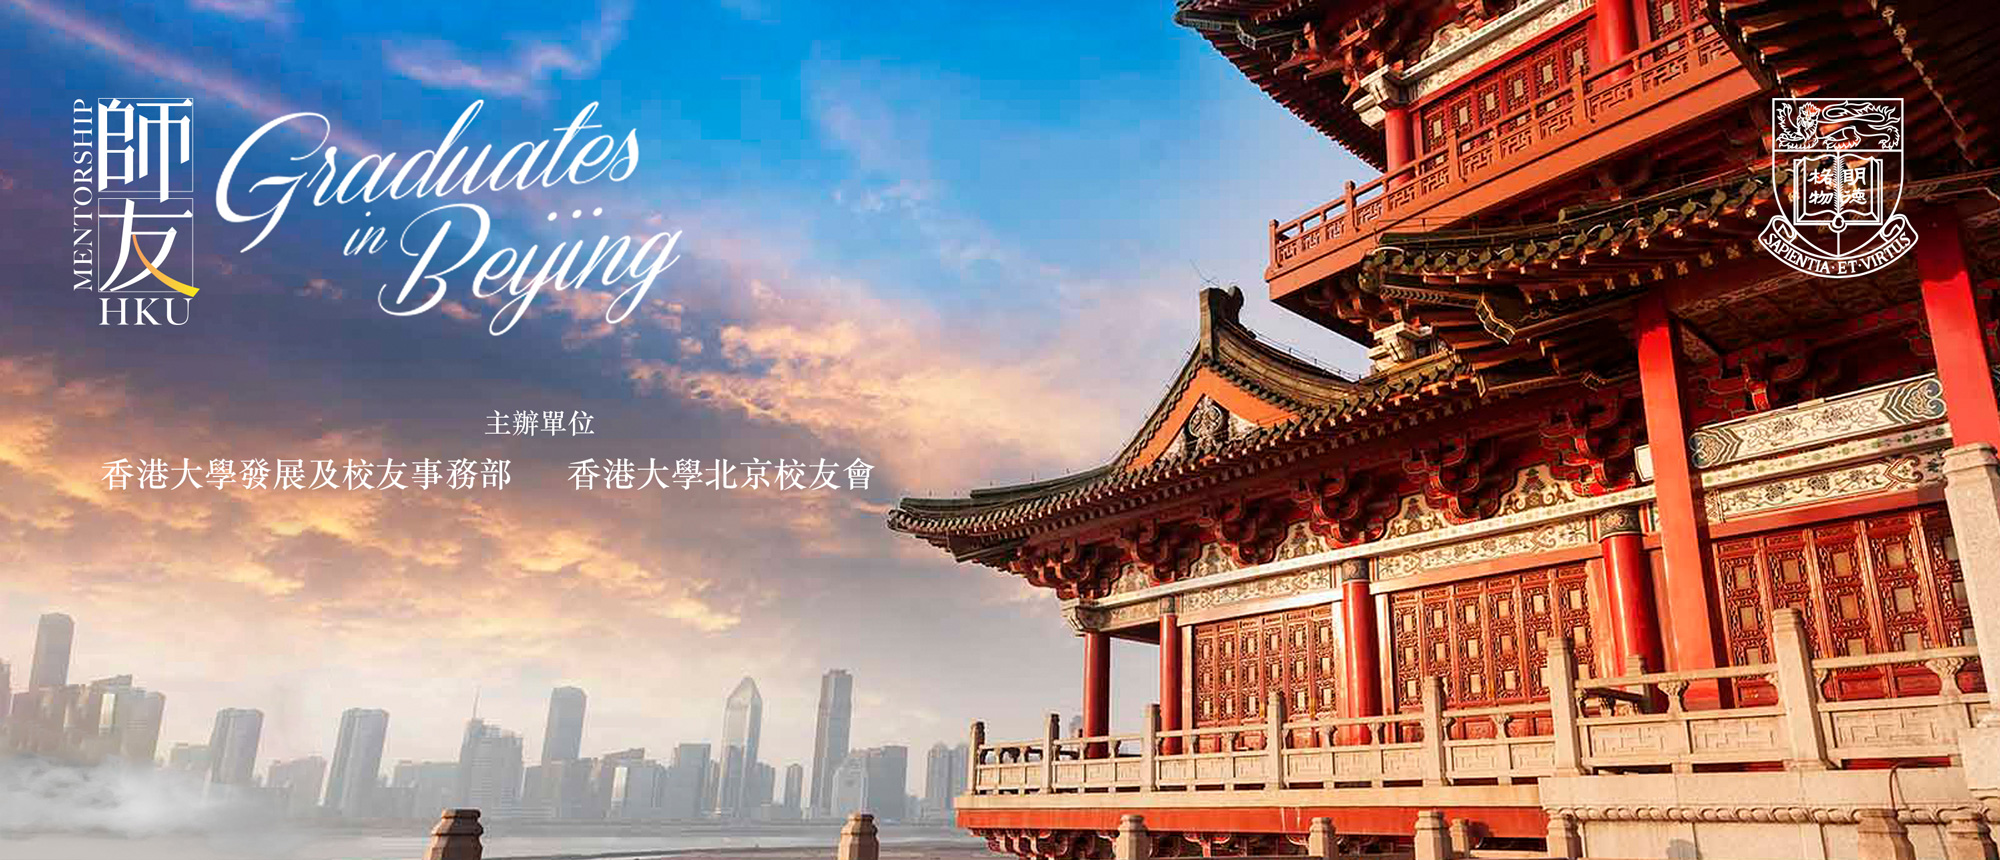 HKU Mentorship - Graduates in Beijing